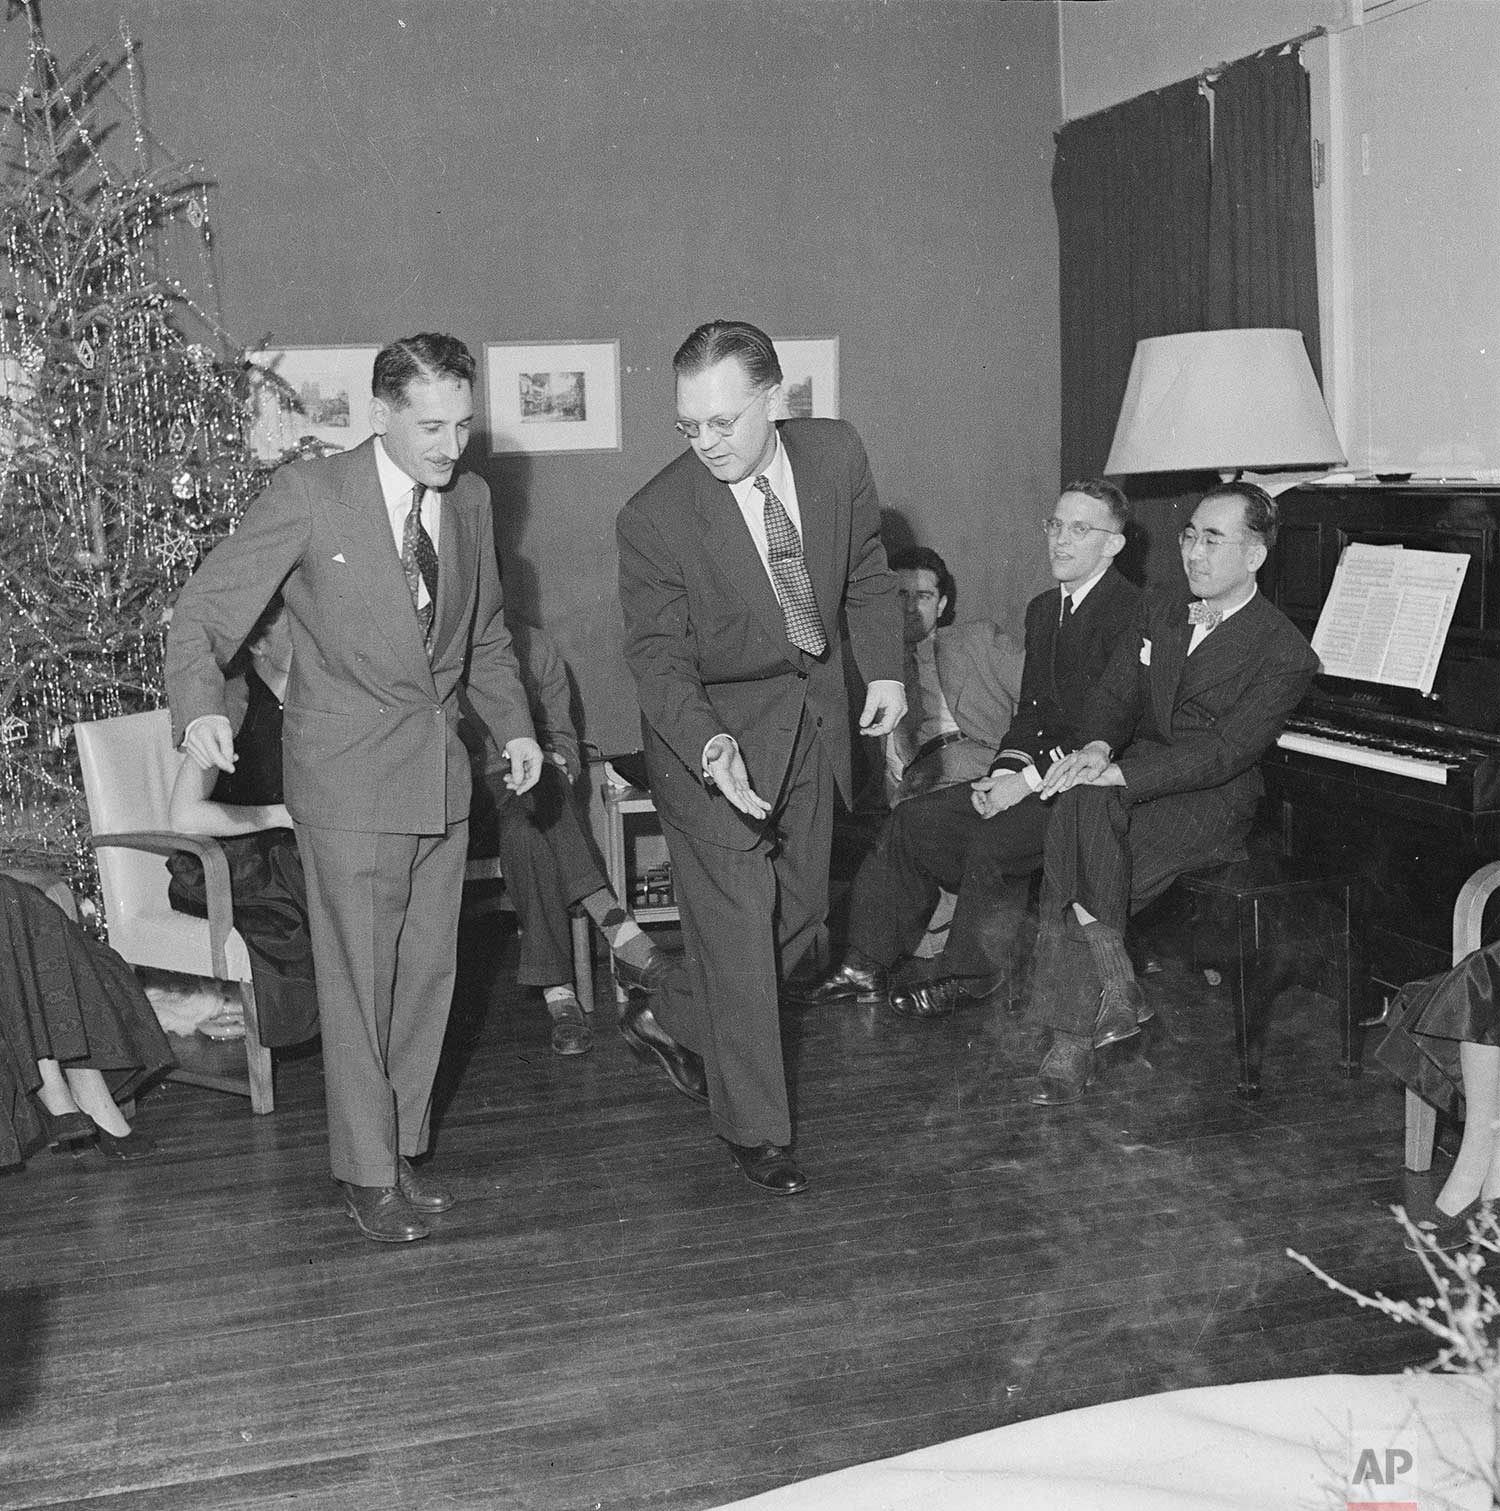 The Tokyo bureau staff enjoyed a Christmas party at Chief of Bureau Bob Eunson's house.  The smooth dance team tapping out a hot waltz clog is photographer Max Desfor and bureau chief Bob Eunson, 1951. (AP Photo)